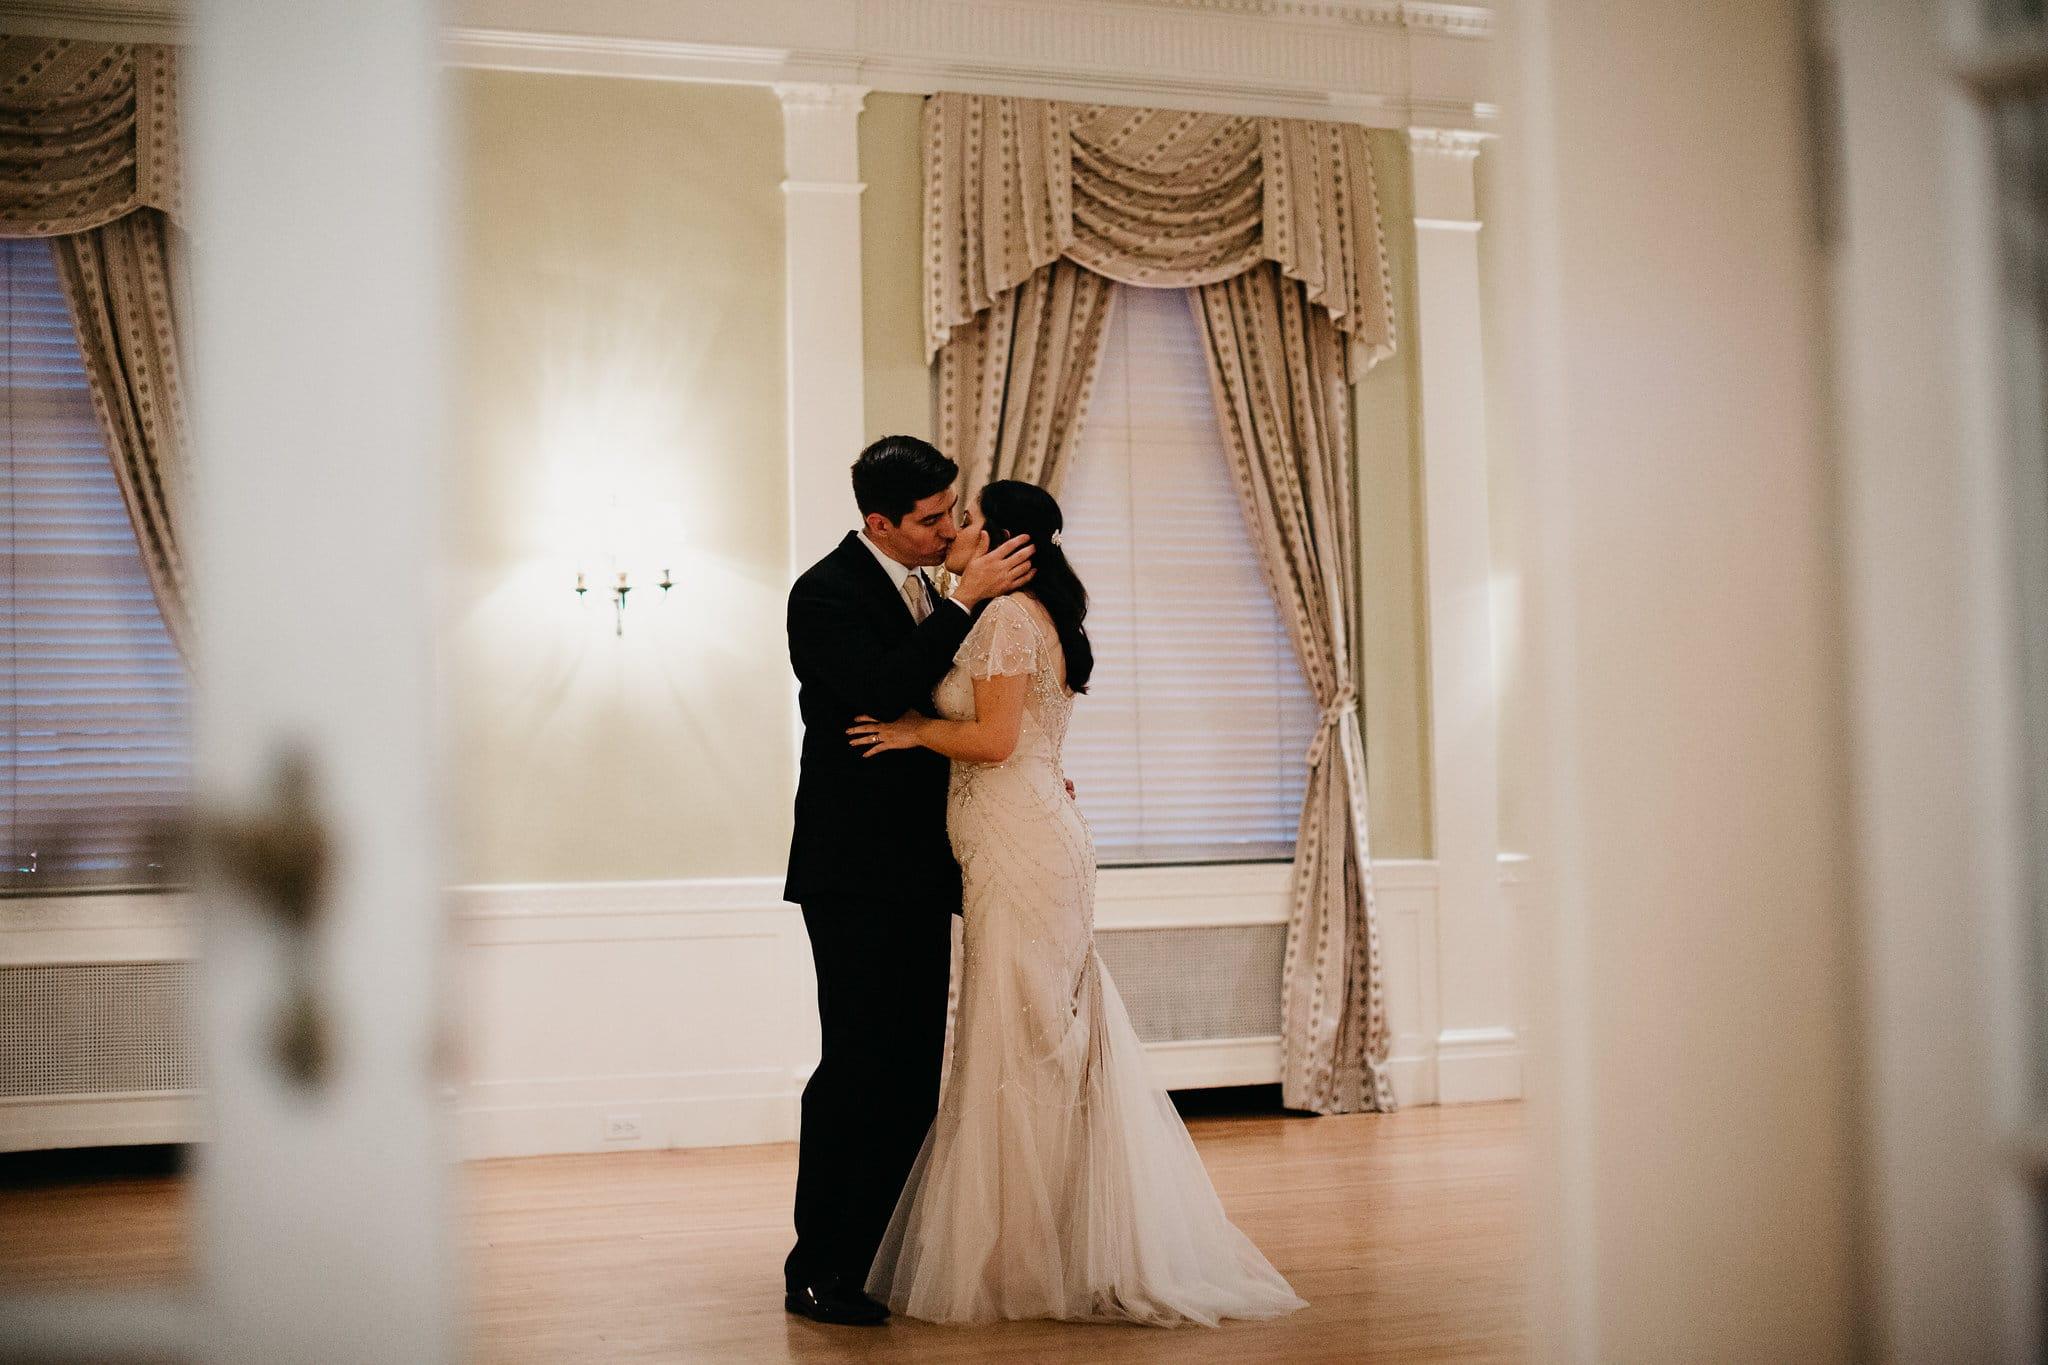 couple kissing on the dance floor